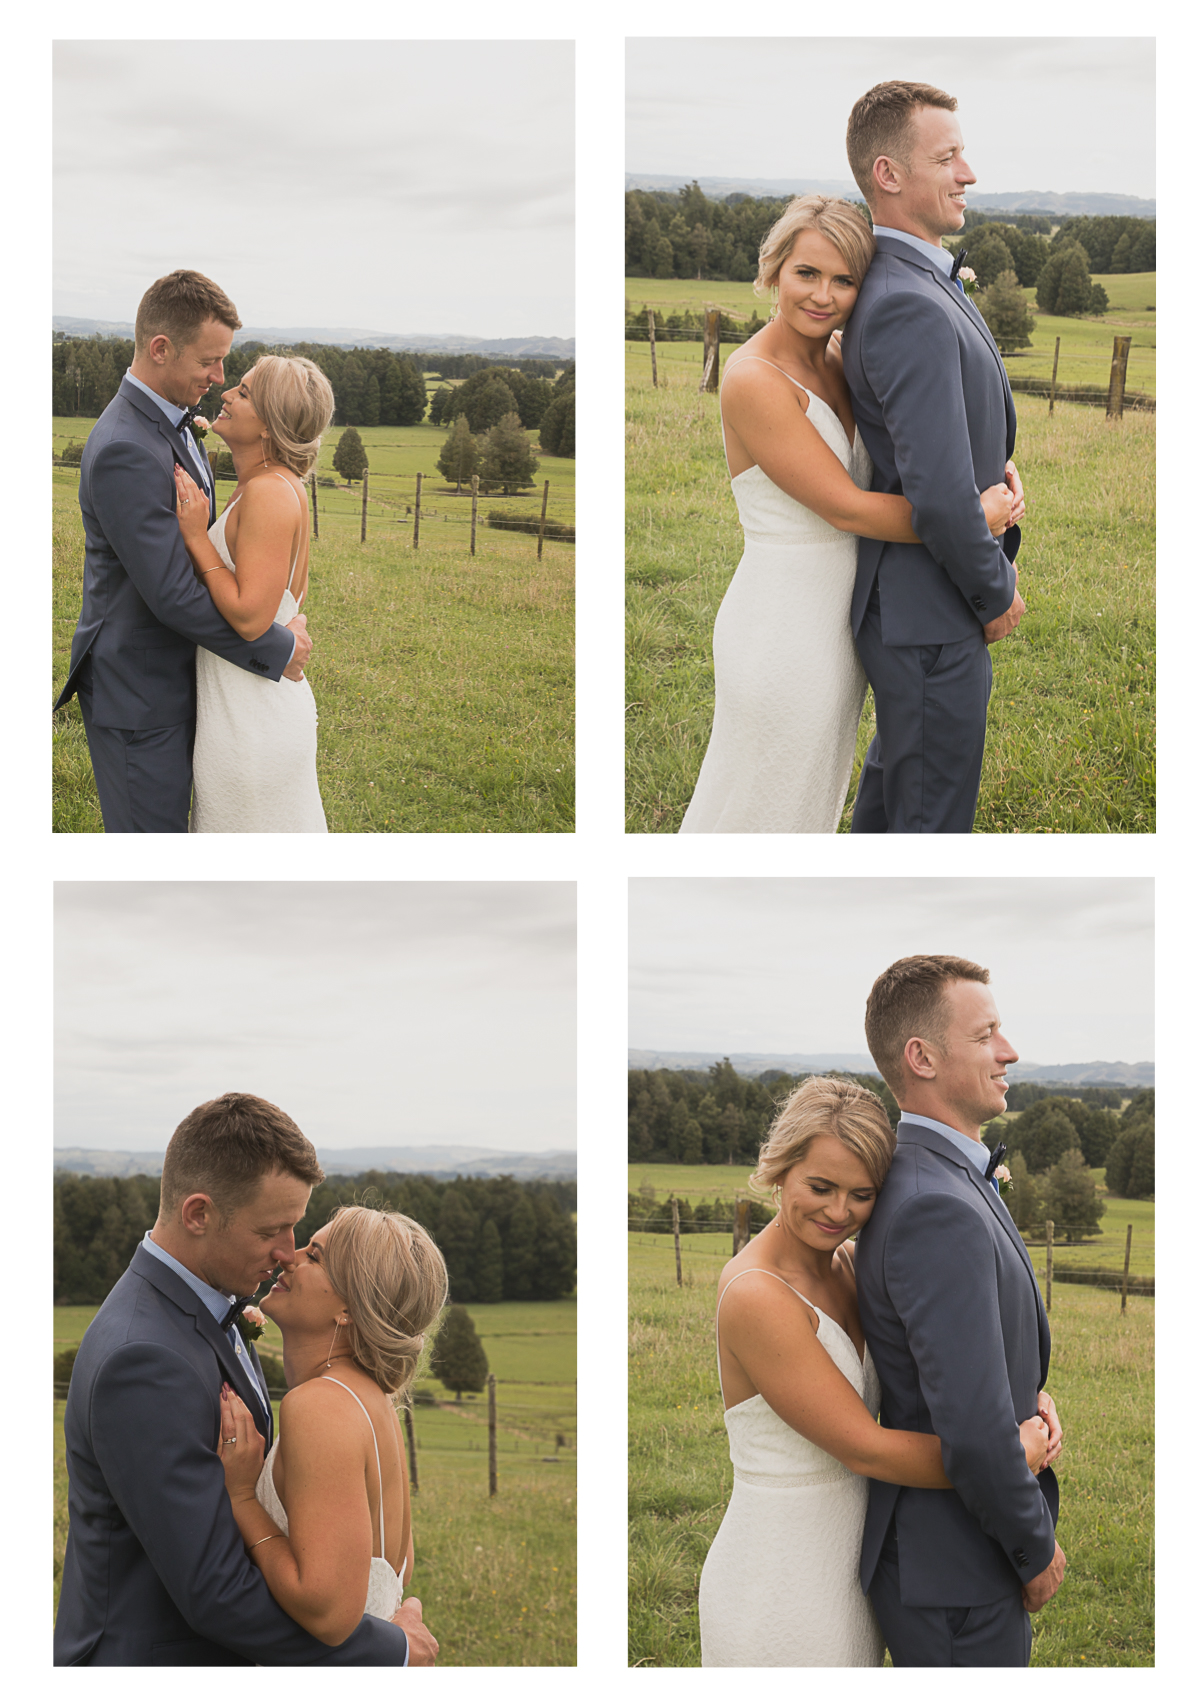 bride-and-groom-cuddling-on-wedding-day.jpg